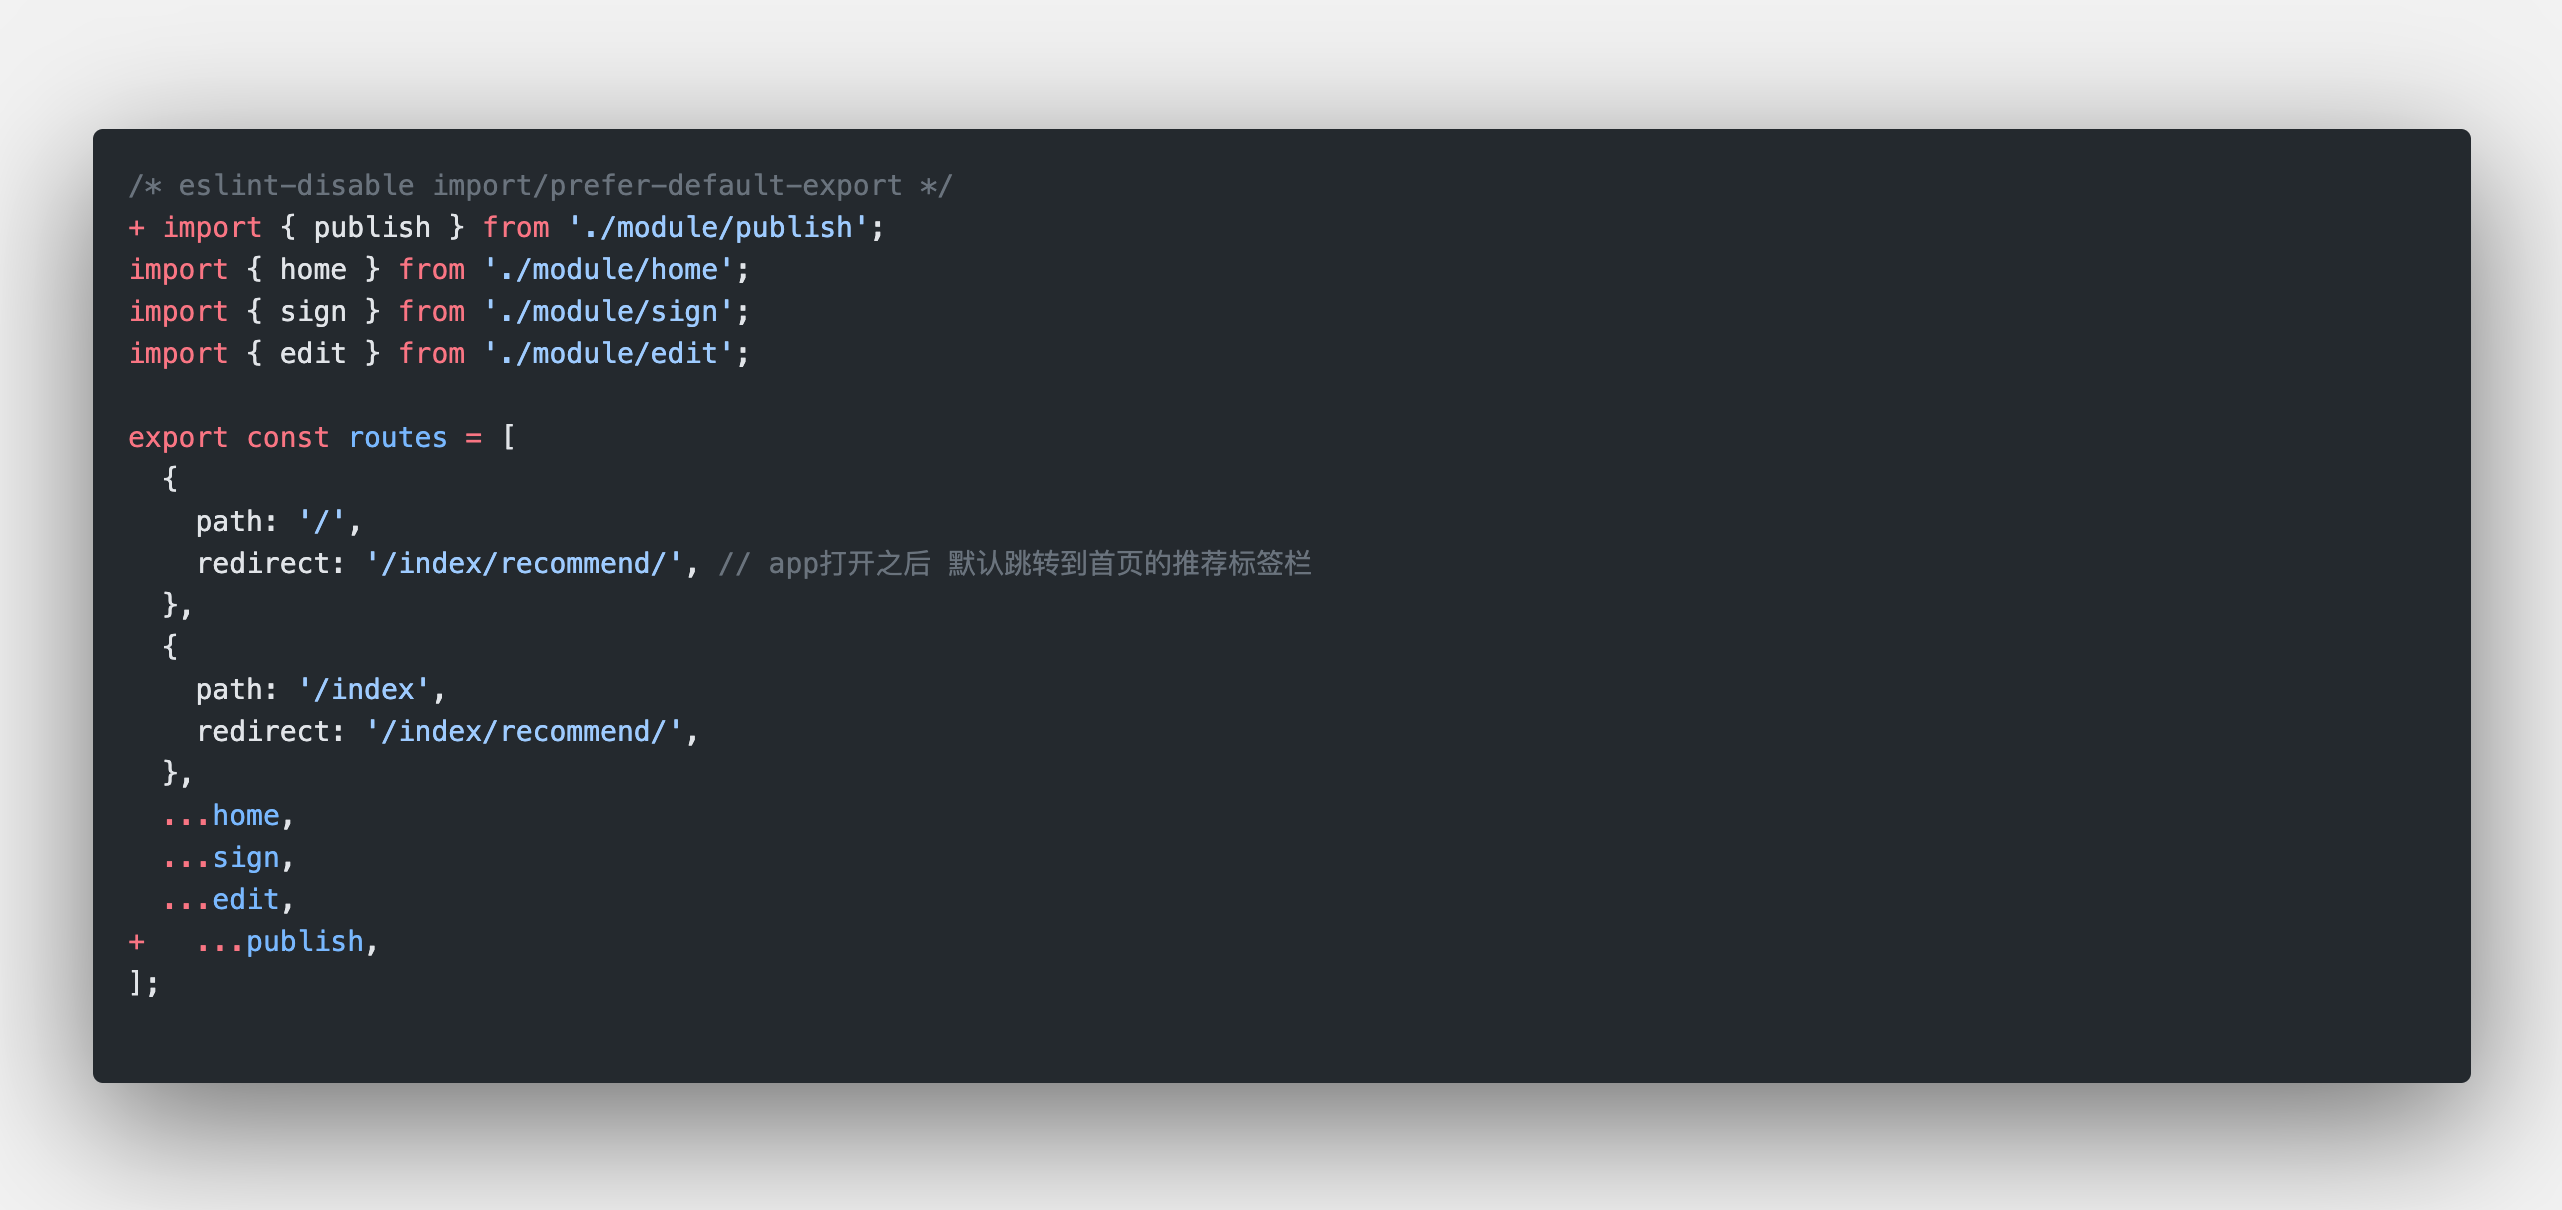 vue实战 实现视频类webapp:(二十一) 发布页面(摄像头调用,视频录制)